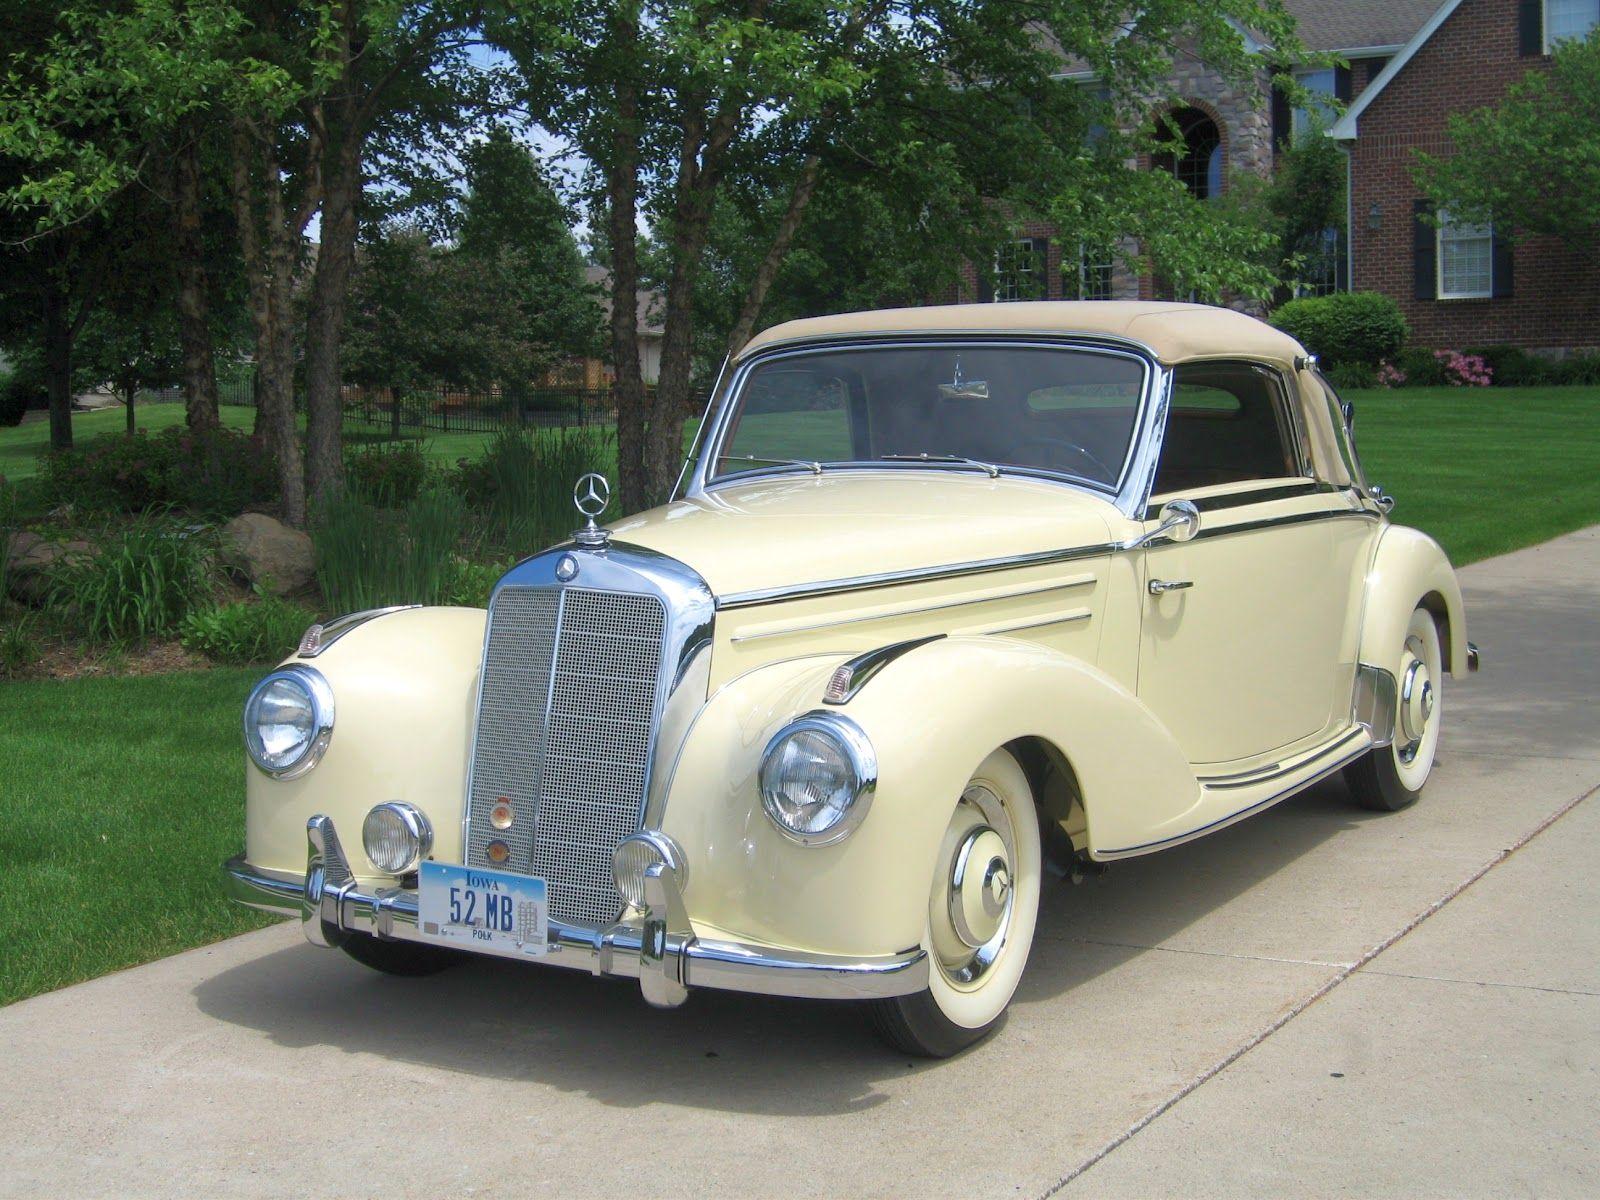 Mercedes benz 220 cabriolet a 1952 design antique for 1952 mercedes benz